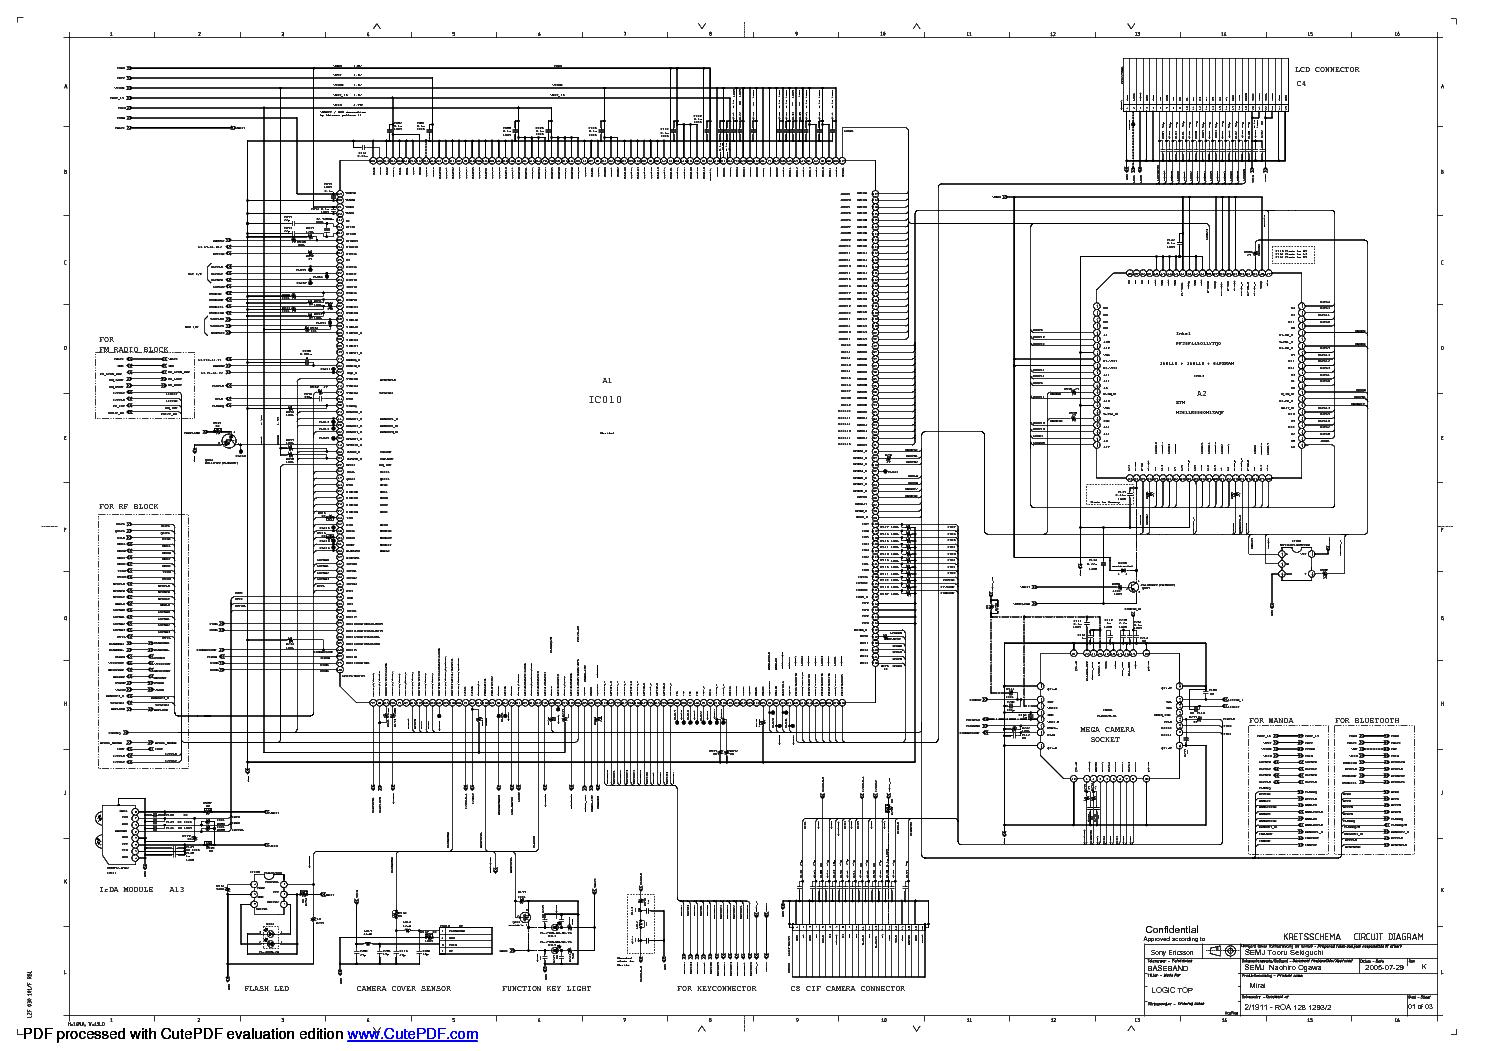 sony ericsson k600 sch service manual download schematics eeprom rh elektrotanya com Sony Ericsson ST18i Sony Ericsson S500i Software